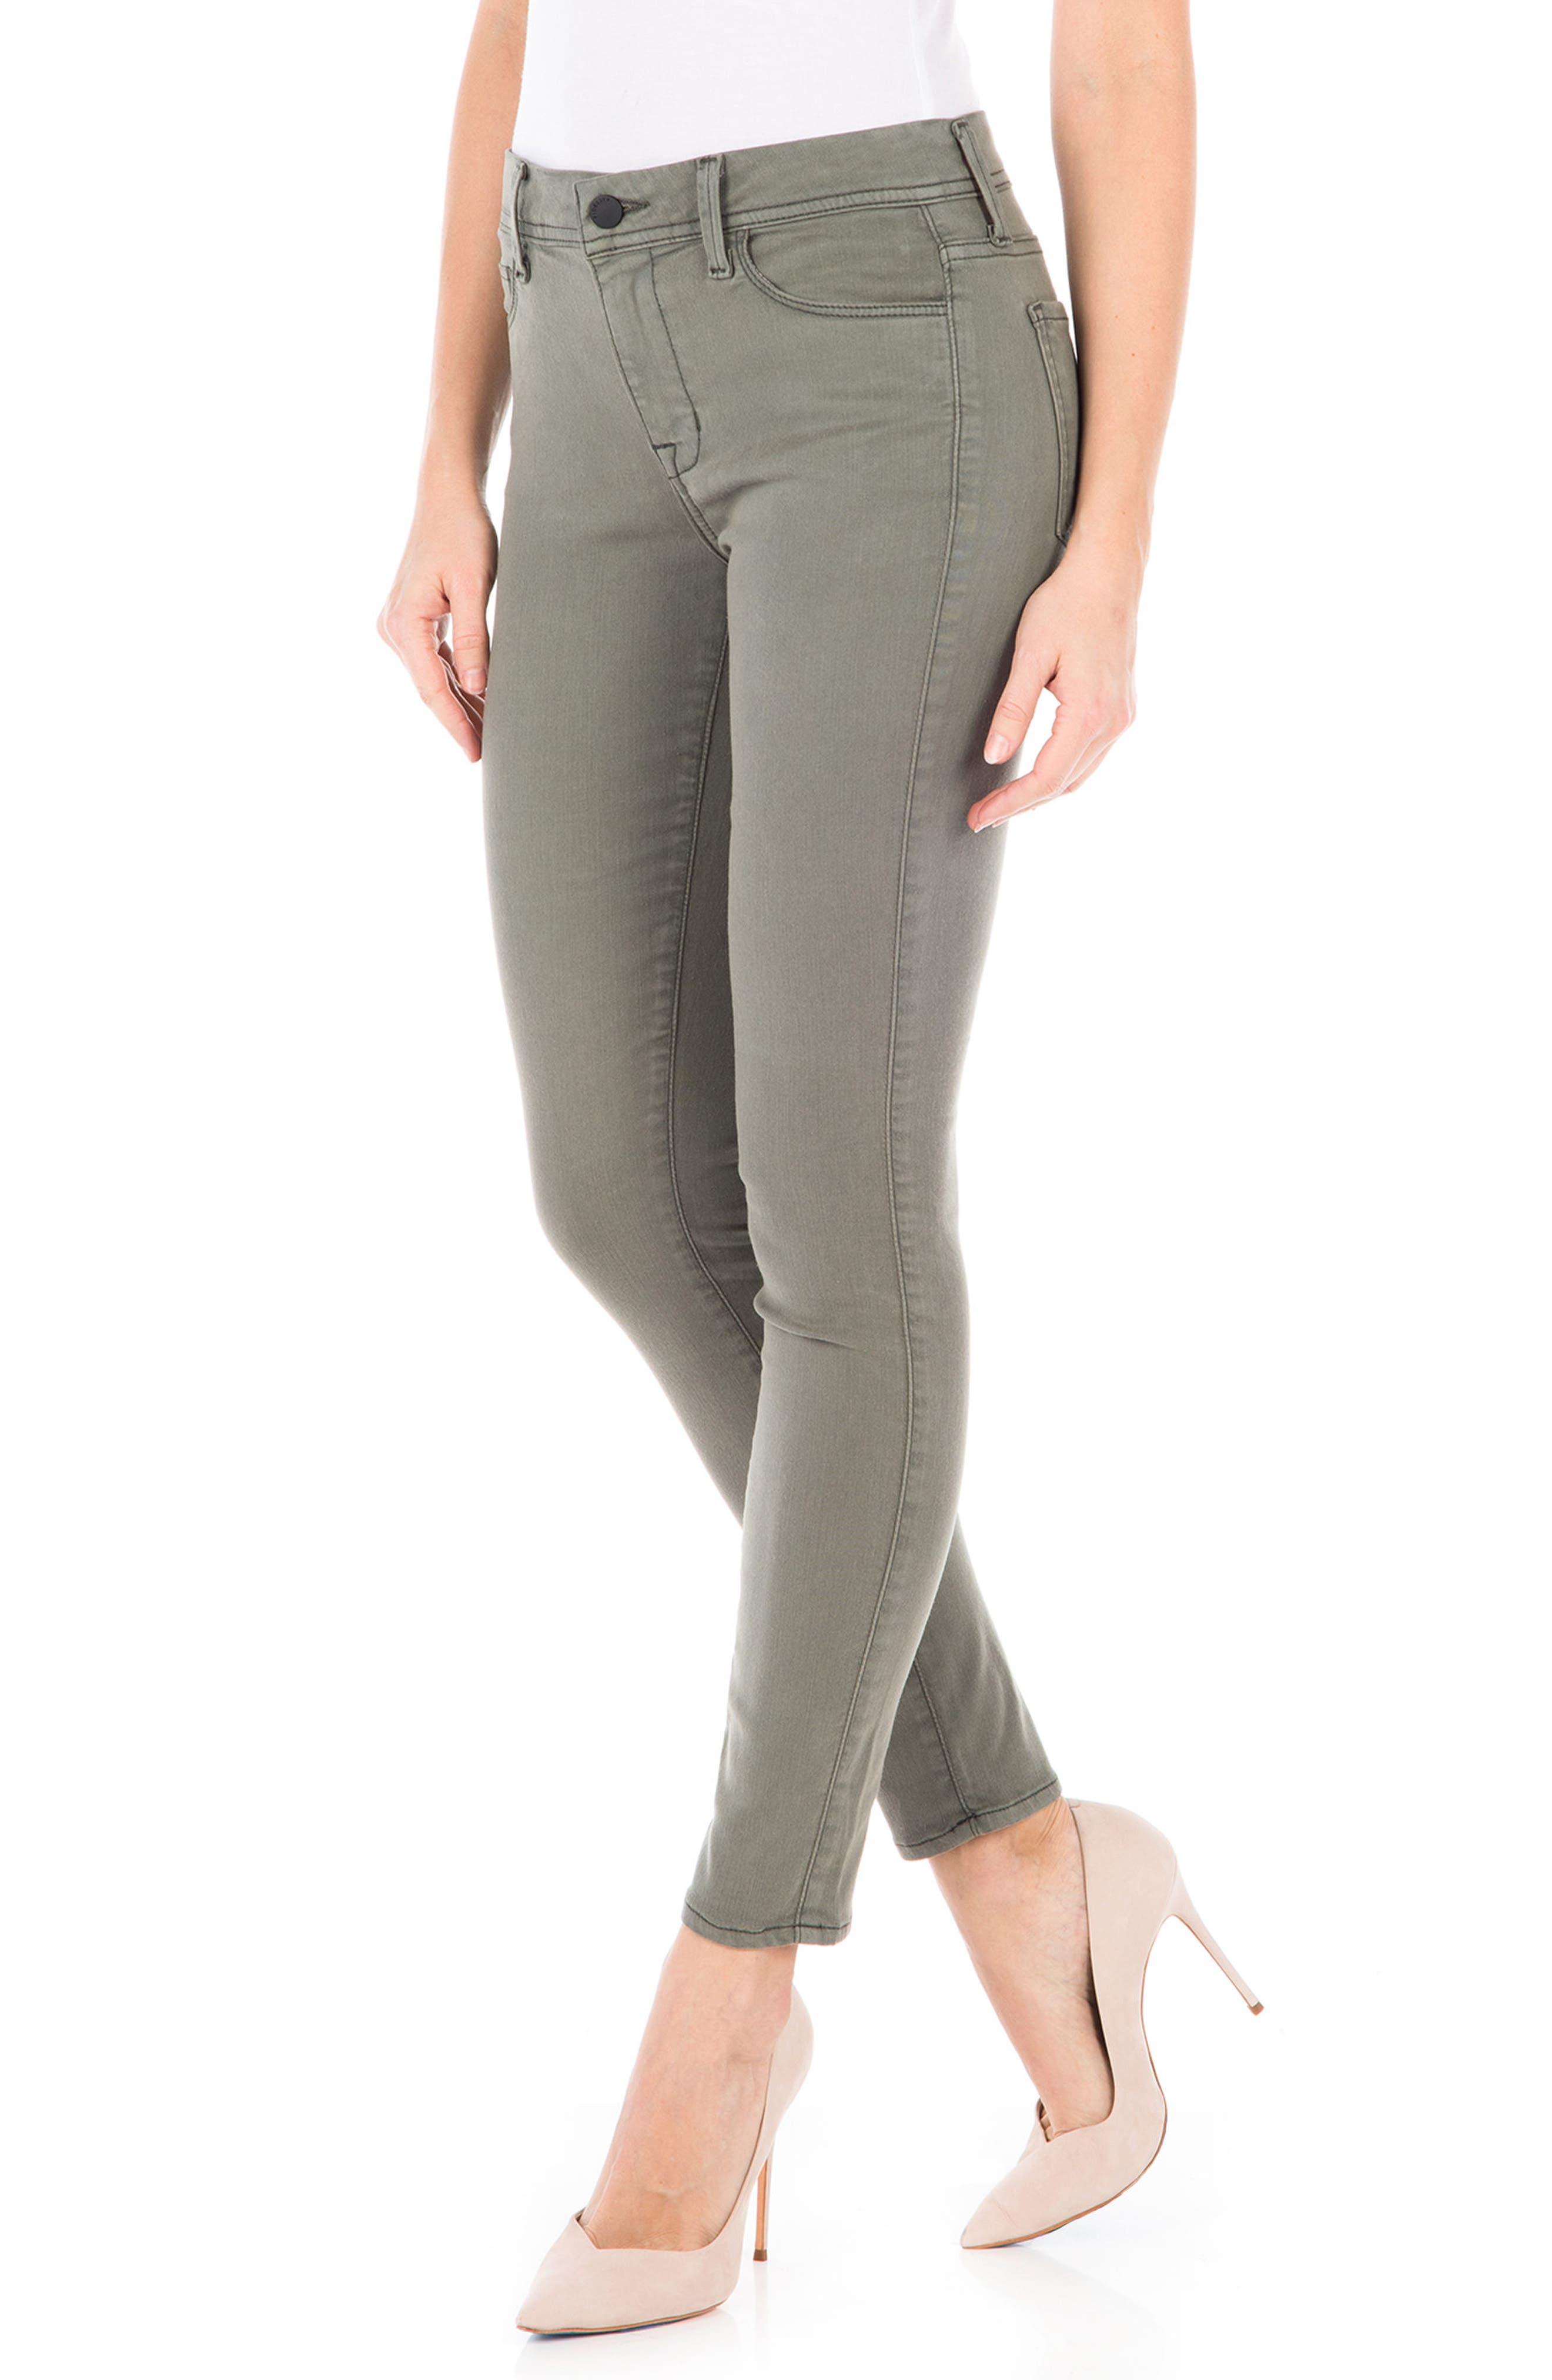 Sola Skinny Jeans,                             Alternate thumbnail 3, color,                             Pistachio